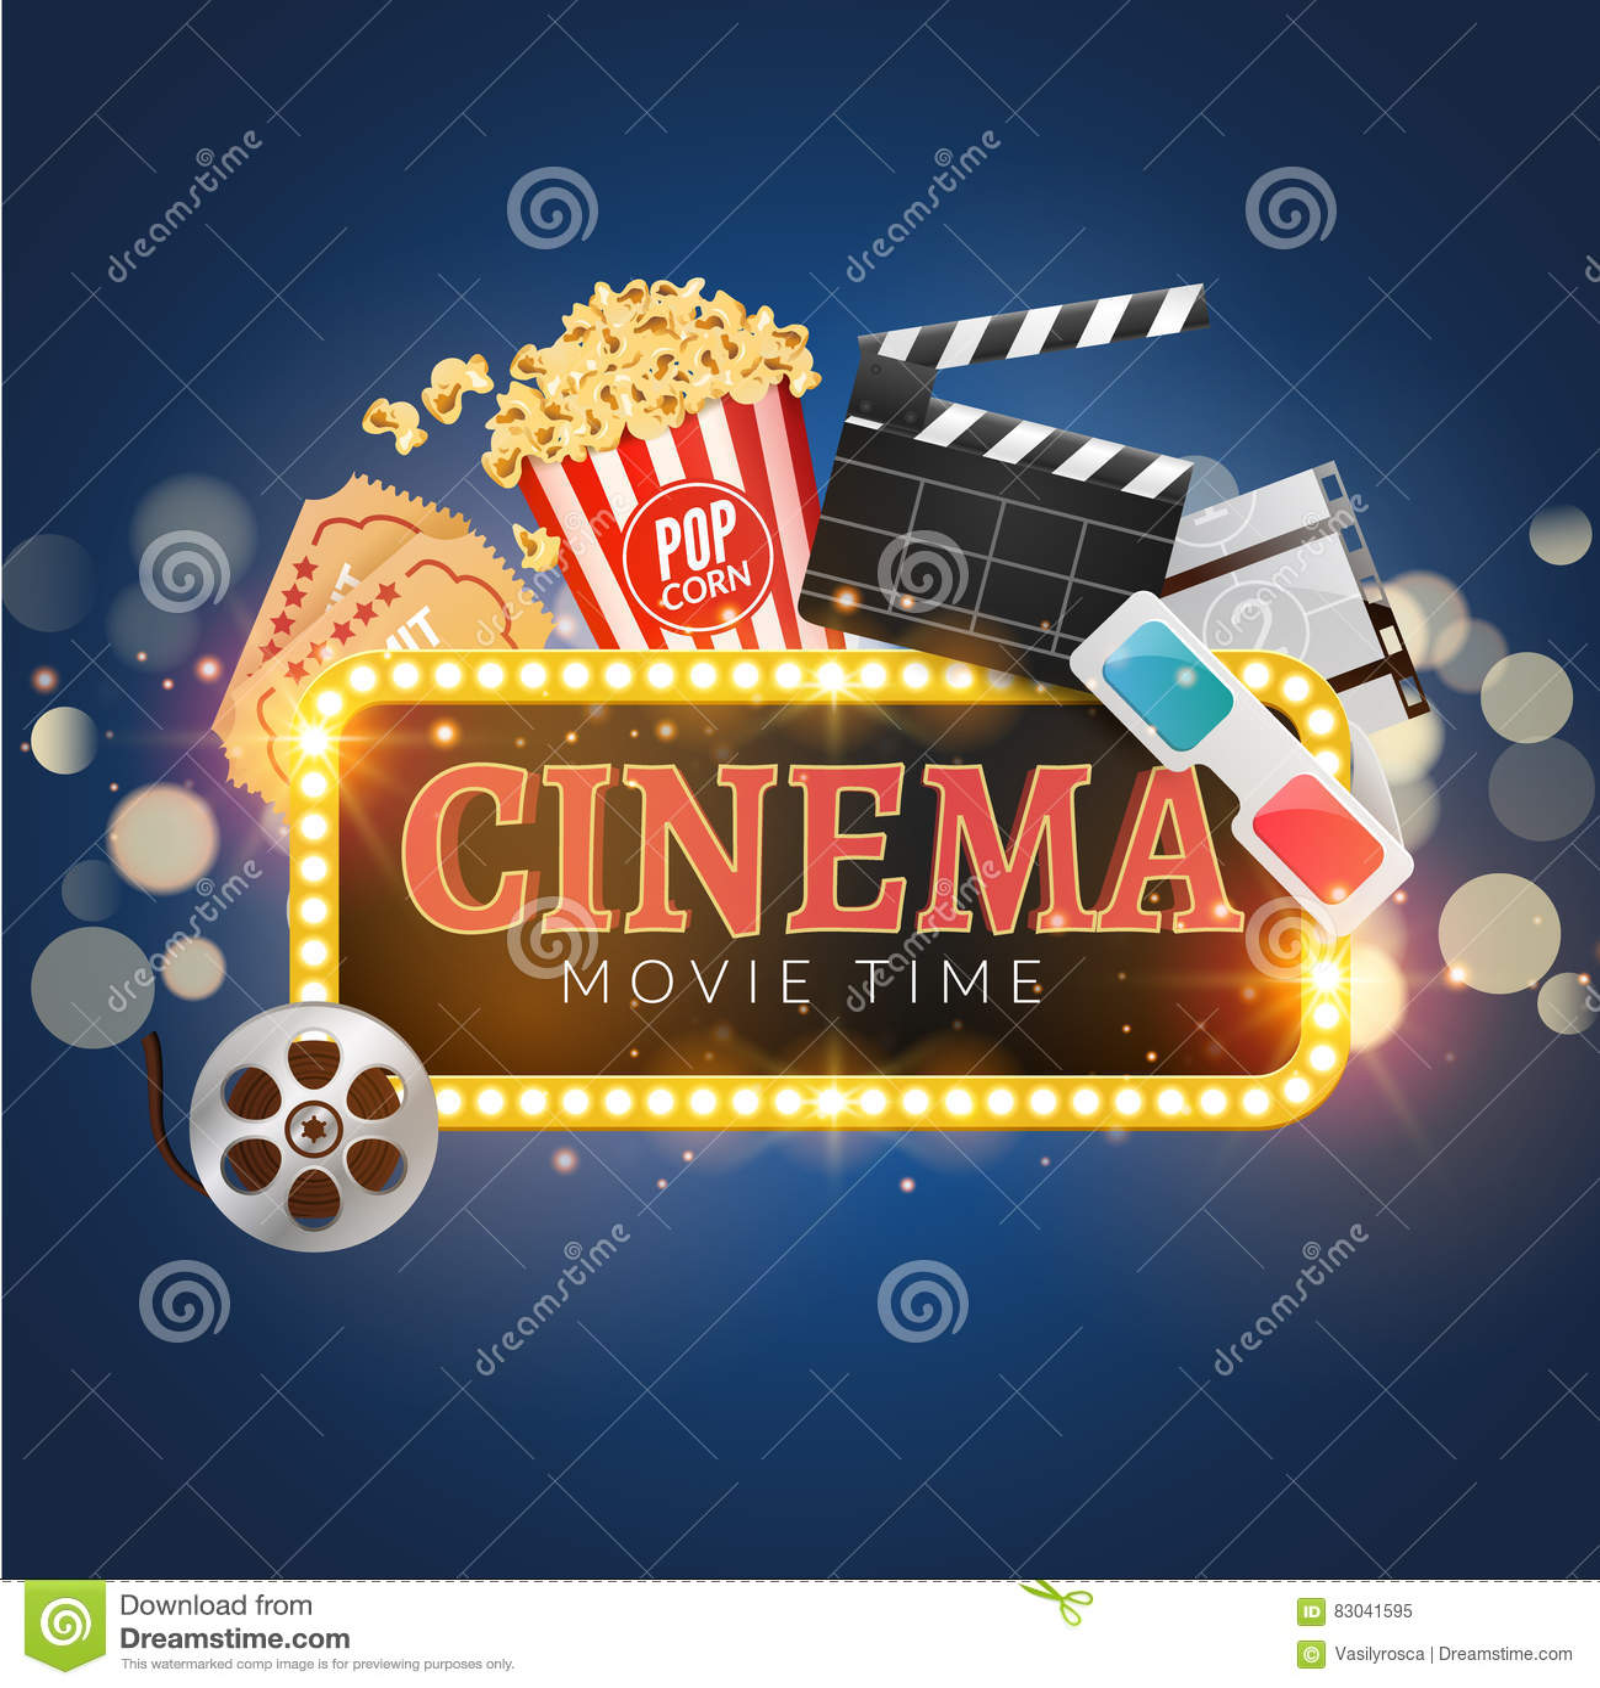 cinema movie vector poster design template  popcorn